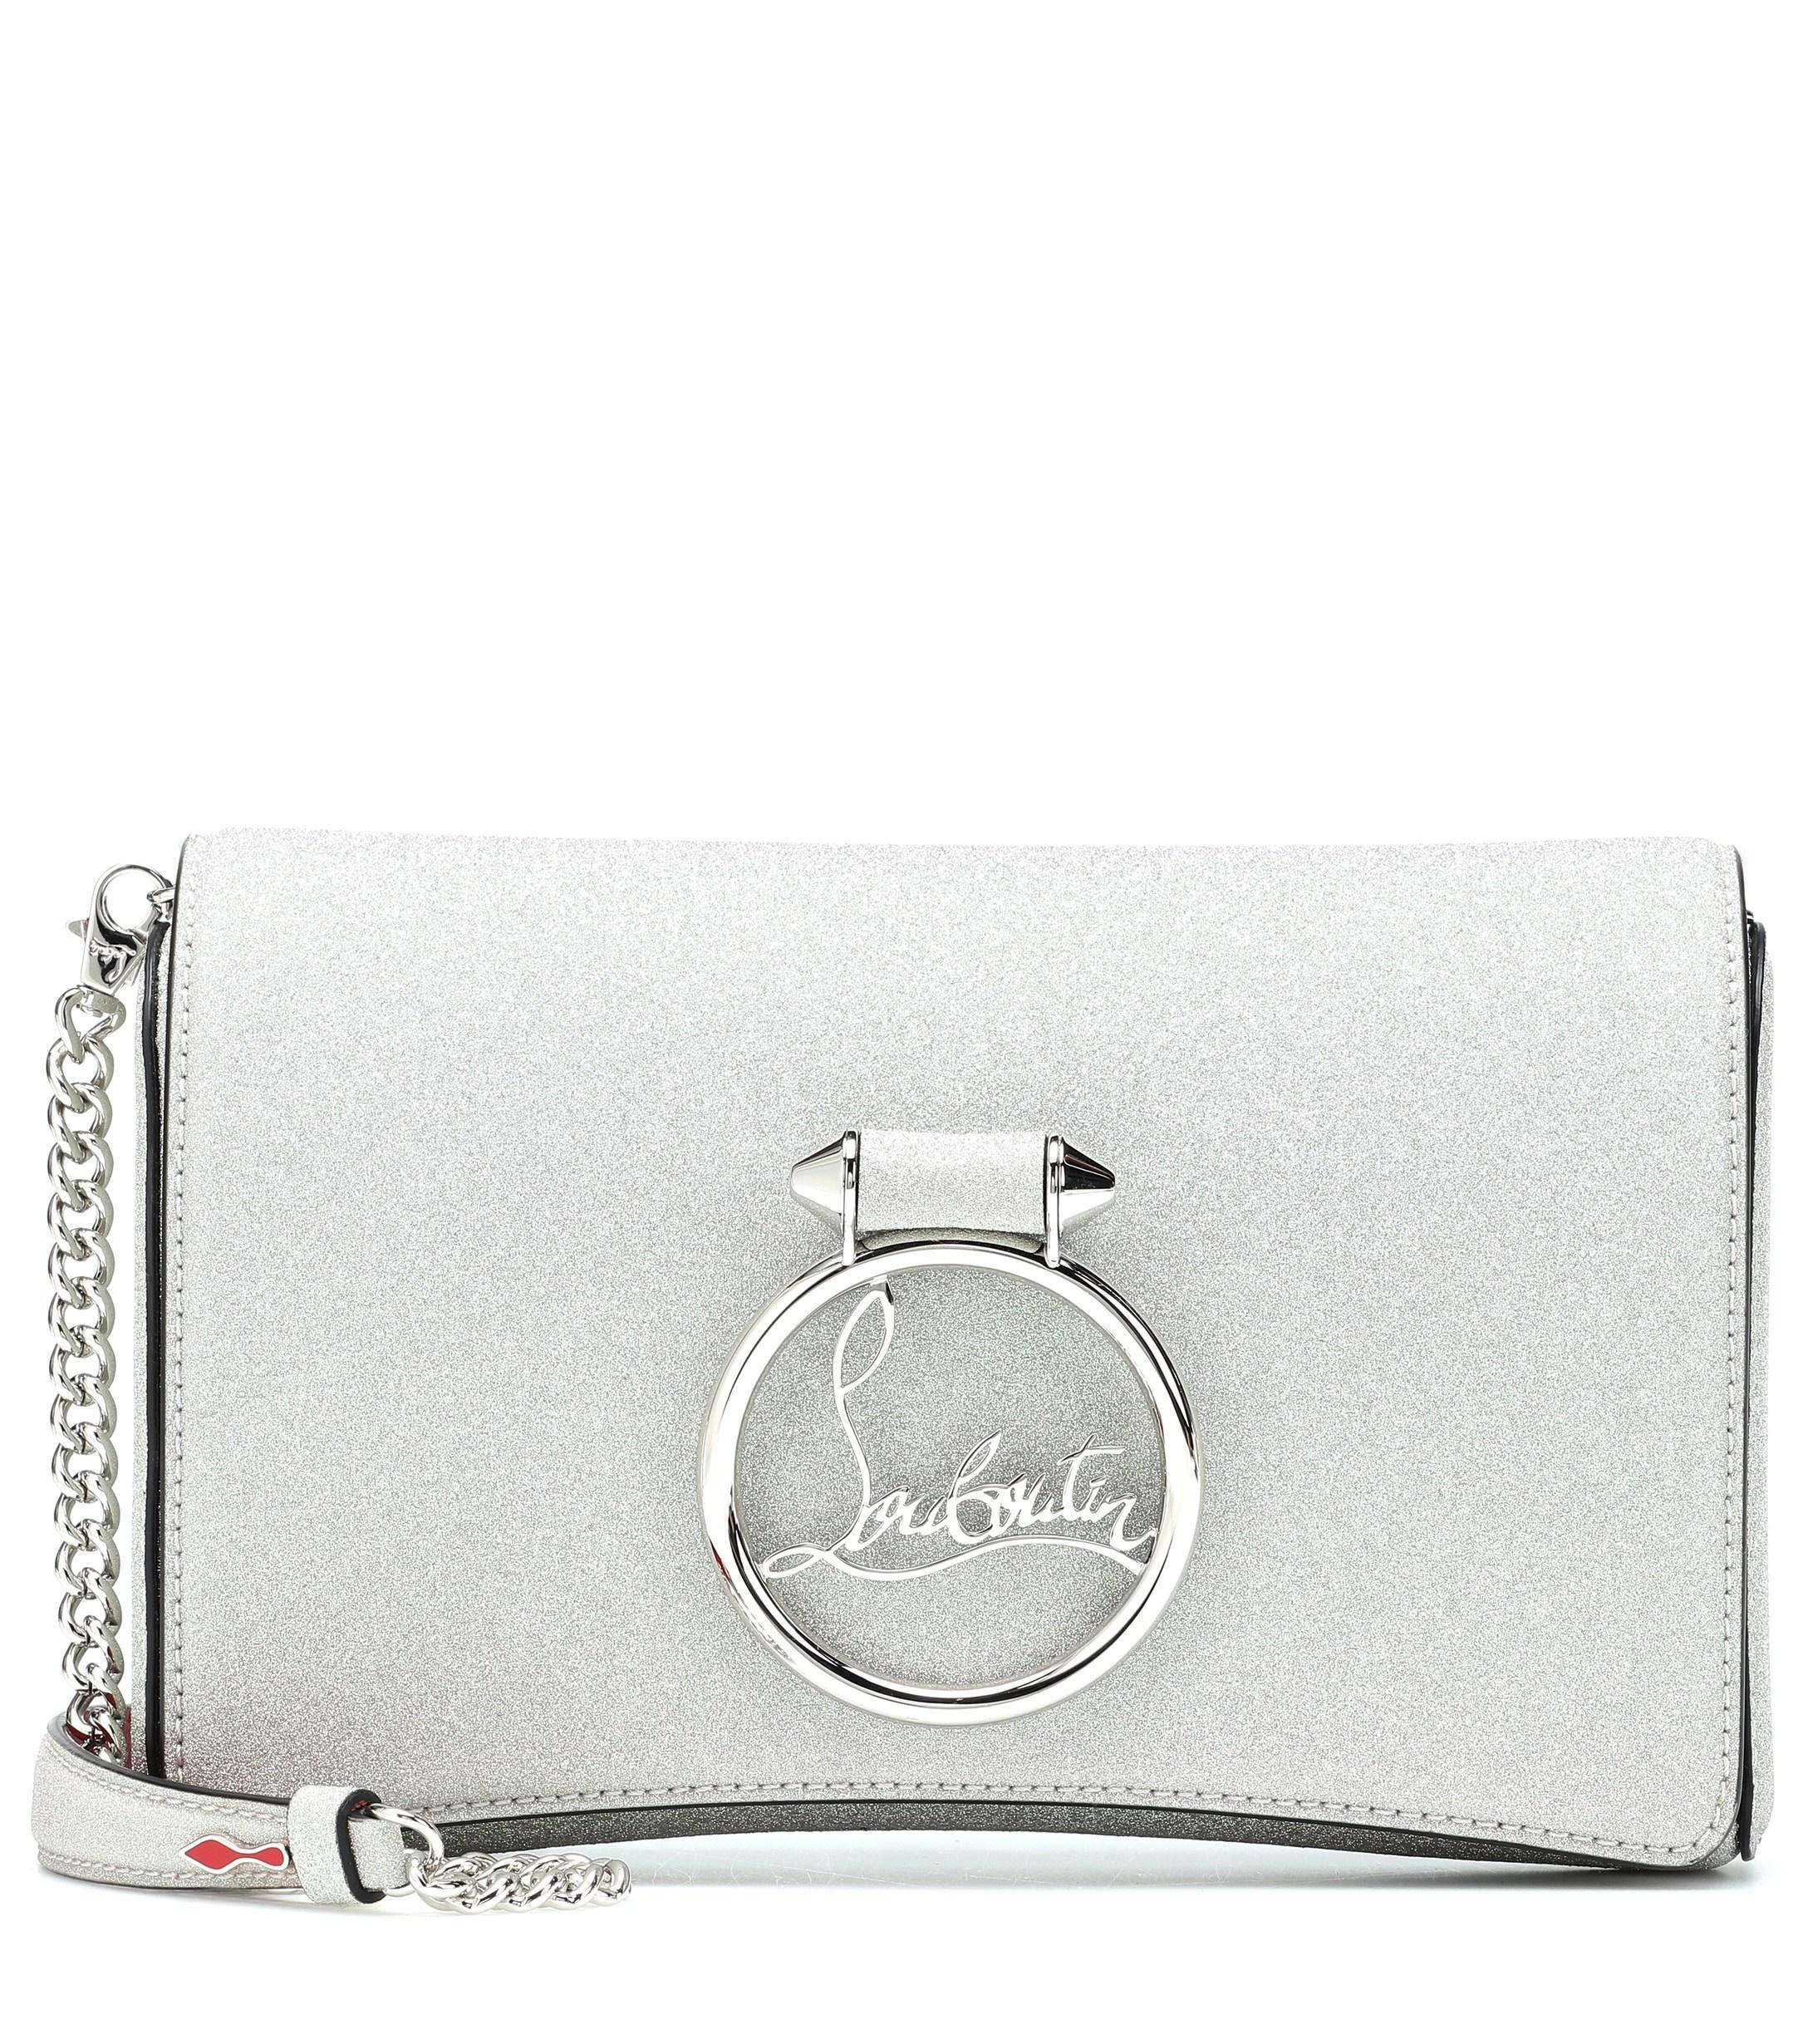 85a92c9ab4f5 Christian Louboutin. Women s Rubylou Glitter Crossbody Bag